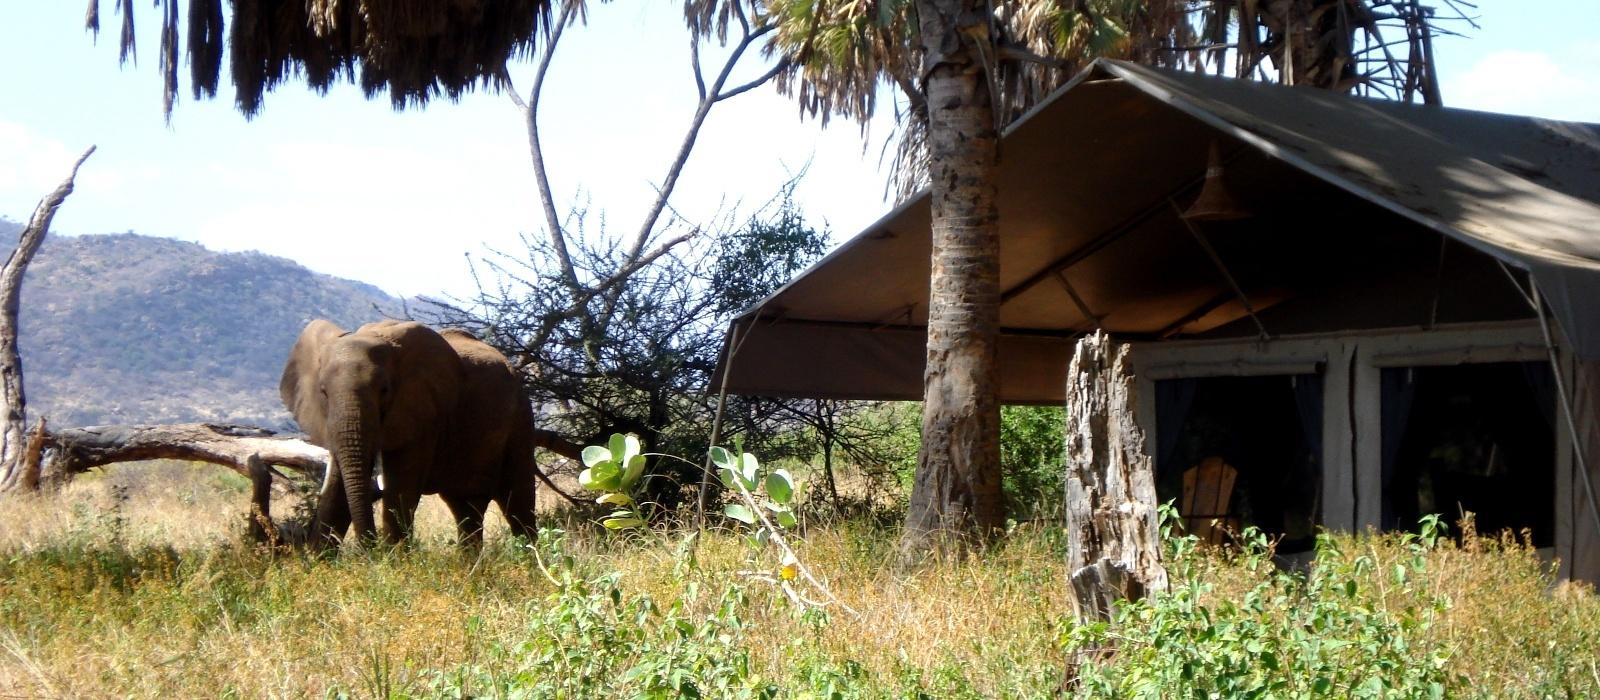 Elephant Bedroom Camp Hotel In Kenya Enchanting Travels